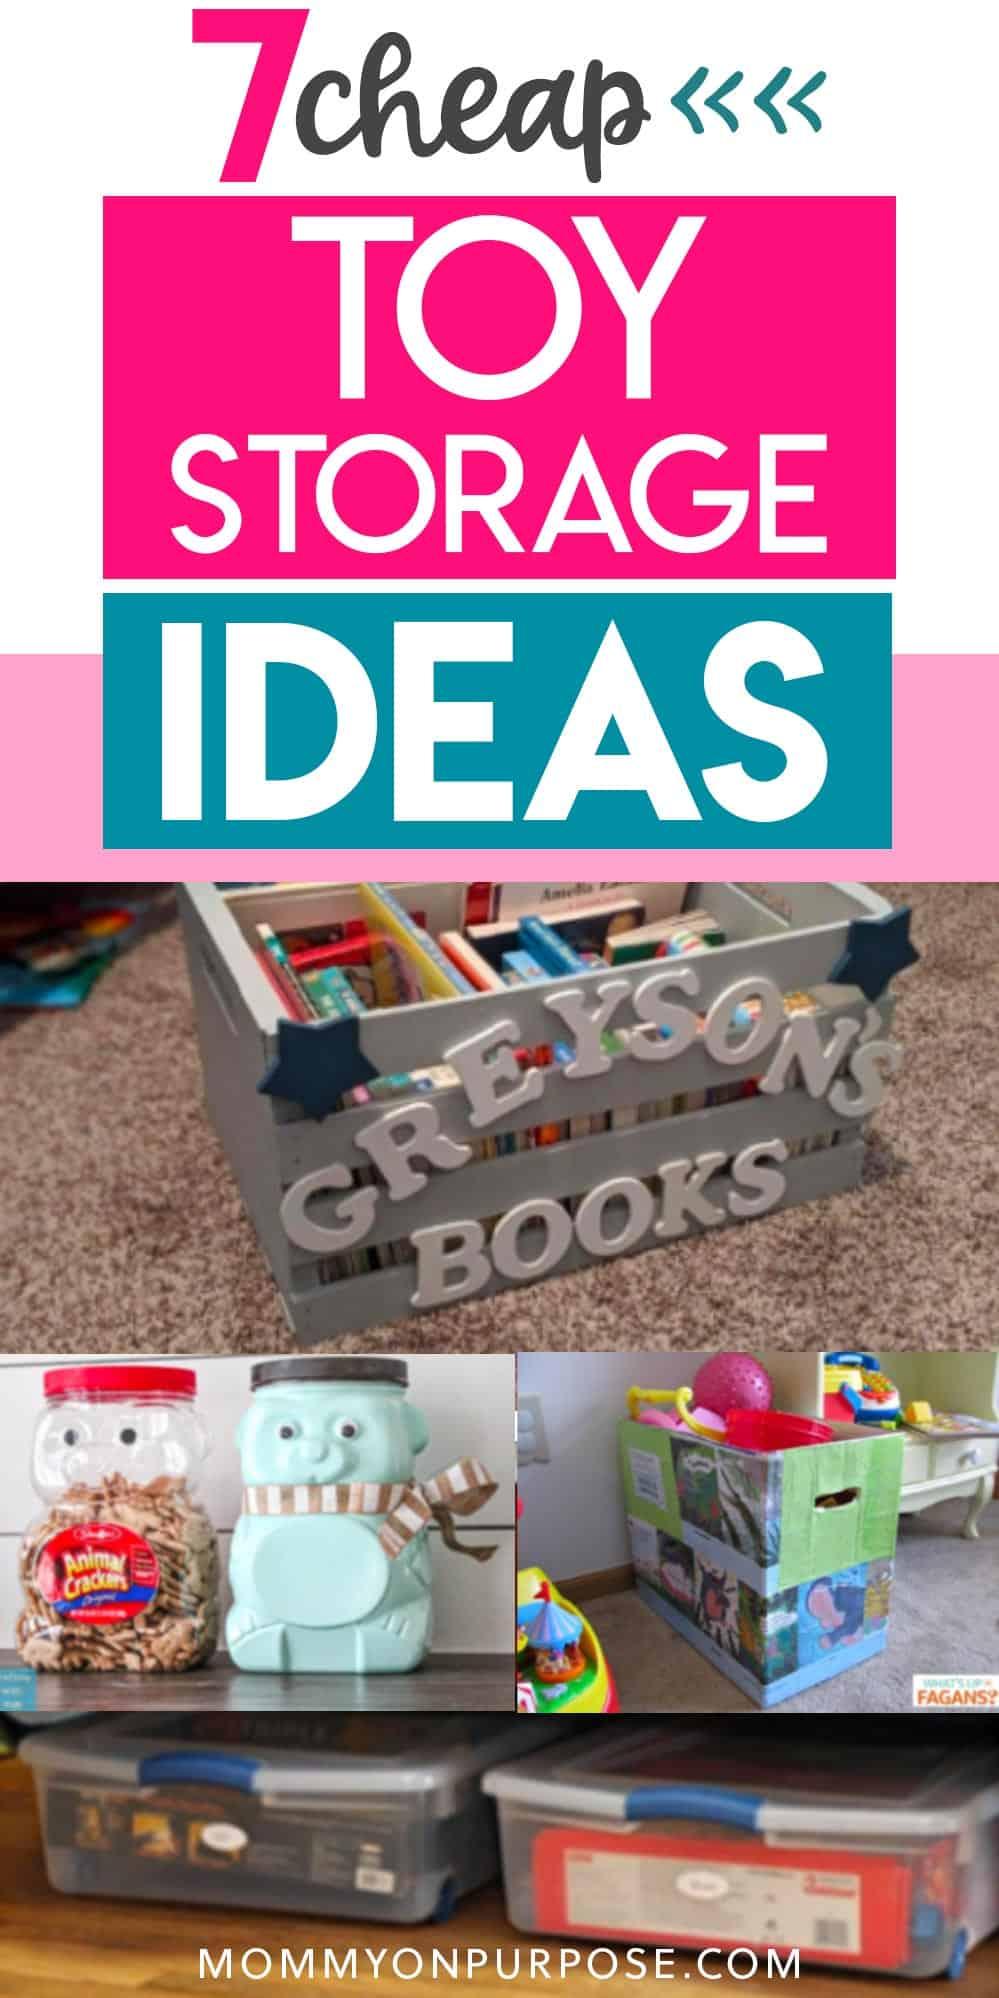 7 cheap toy storage ideas pinterest pin